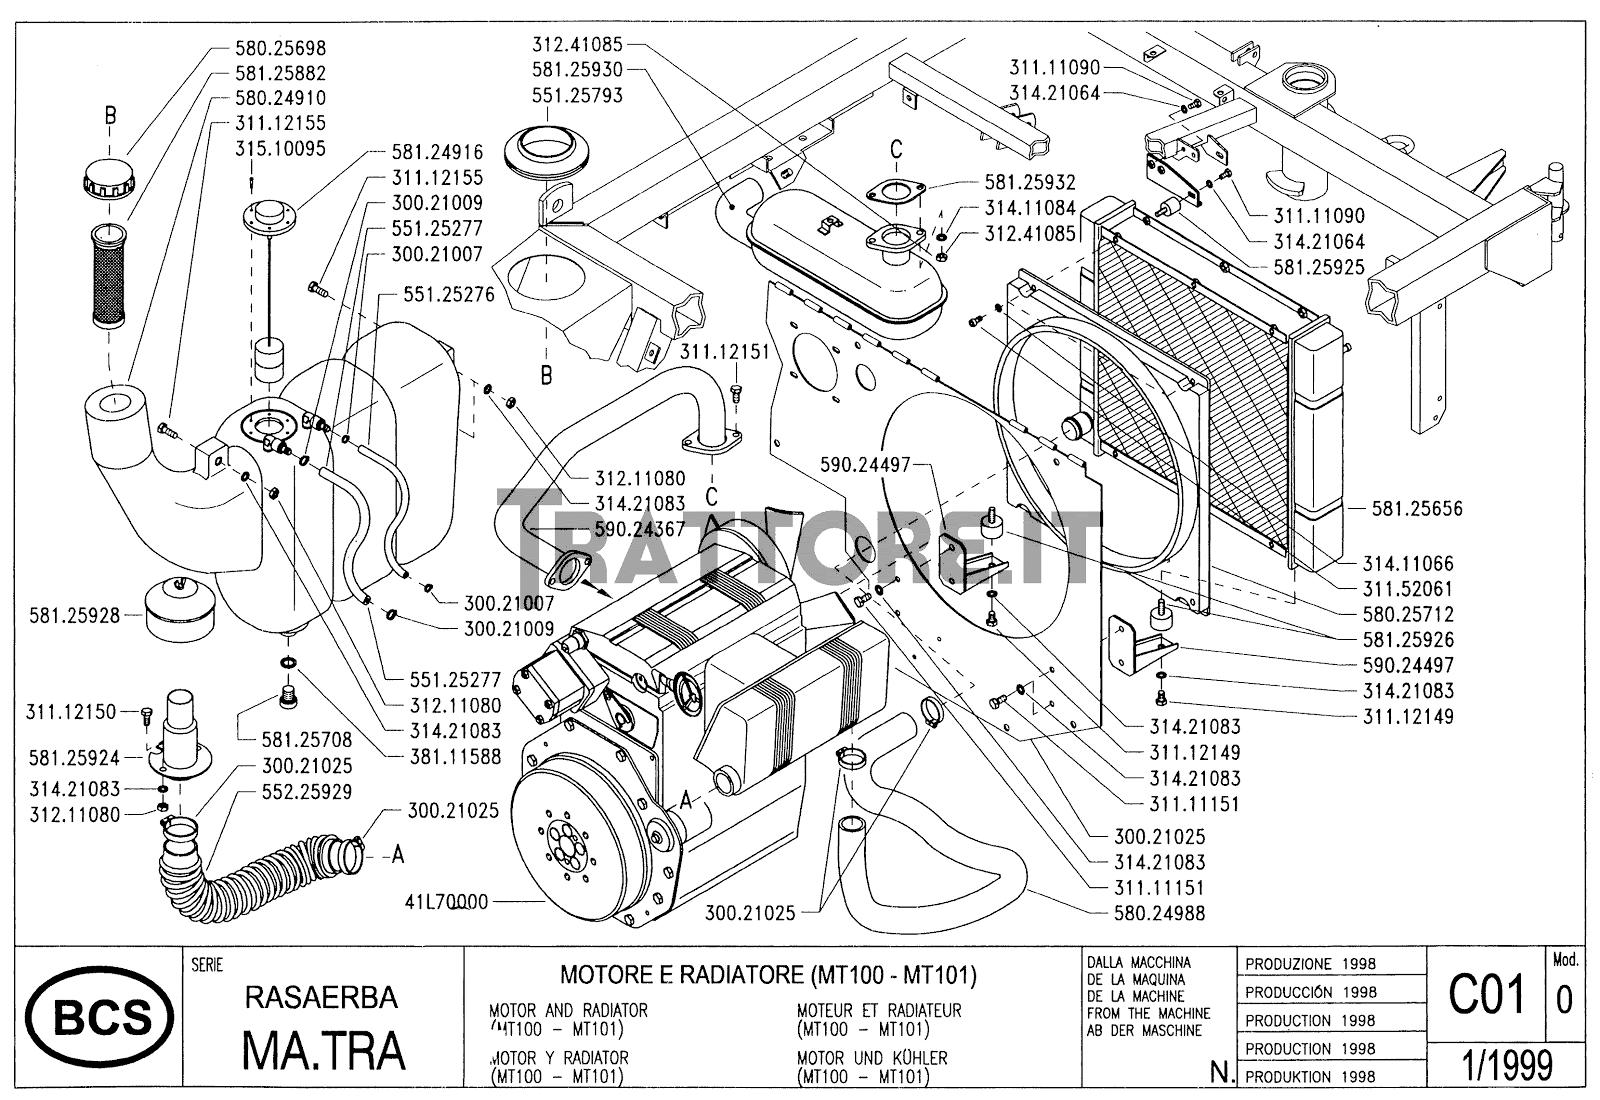 Bcs matra 205 manual